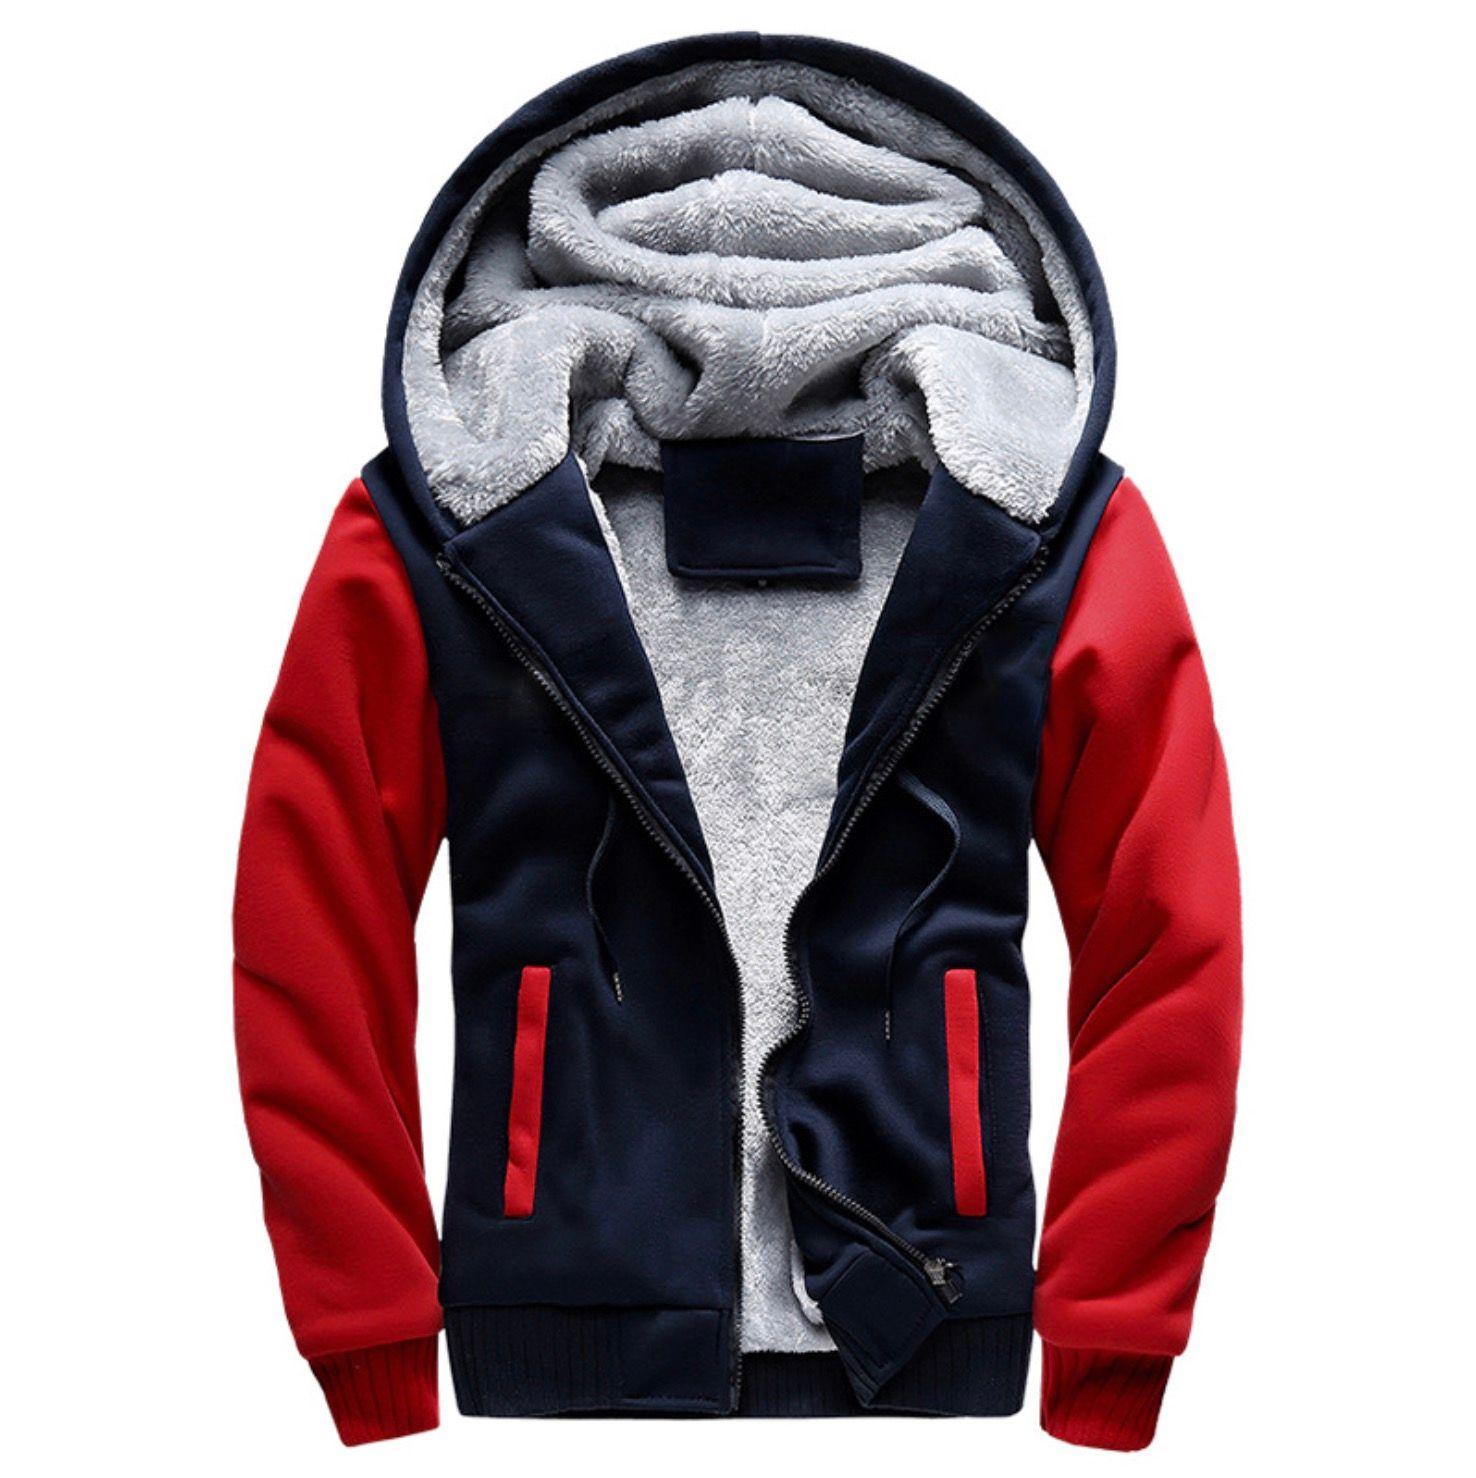 2020 Neue Männer Hoodies Winter Dicke Warme Fleece Reißverschluss Männer Hoodies Mantel Sportbekleidung Männliche Streetwear Hoodies Sweatshirts Männer